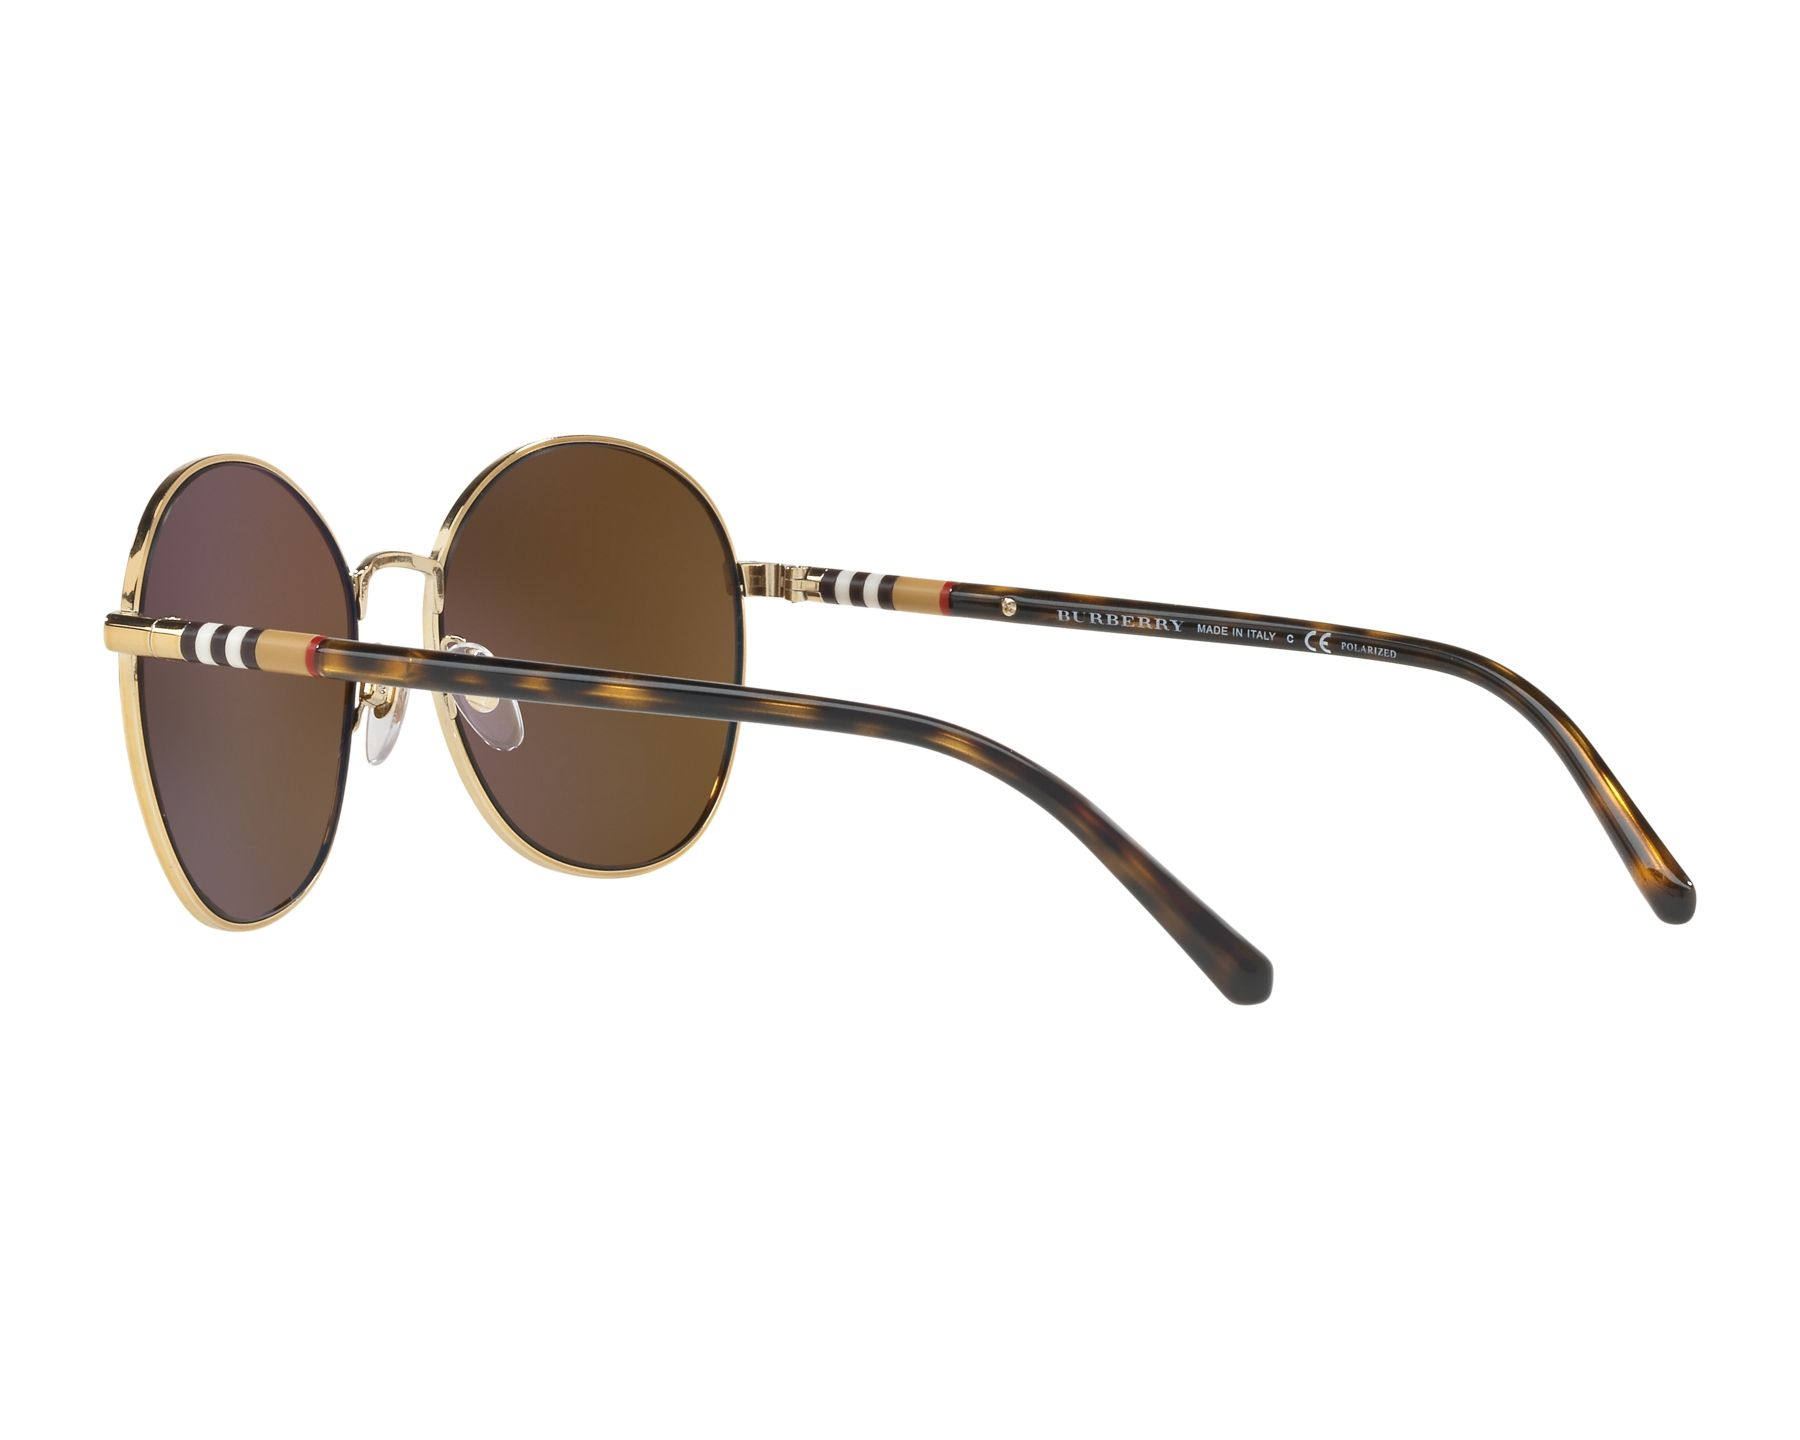 1991964991a Sunglasses Burberry BE-3094 11452O 56-17 Gold Havana 360 degree view 5